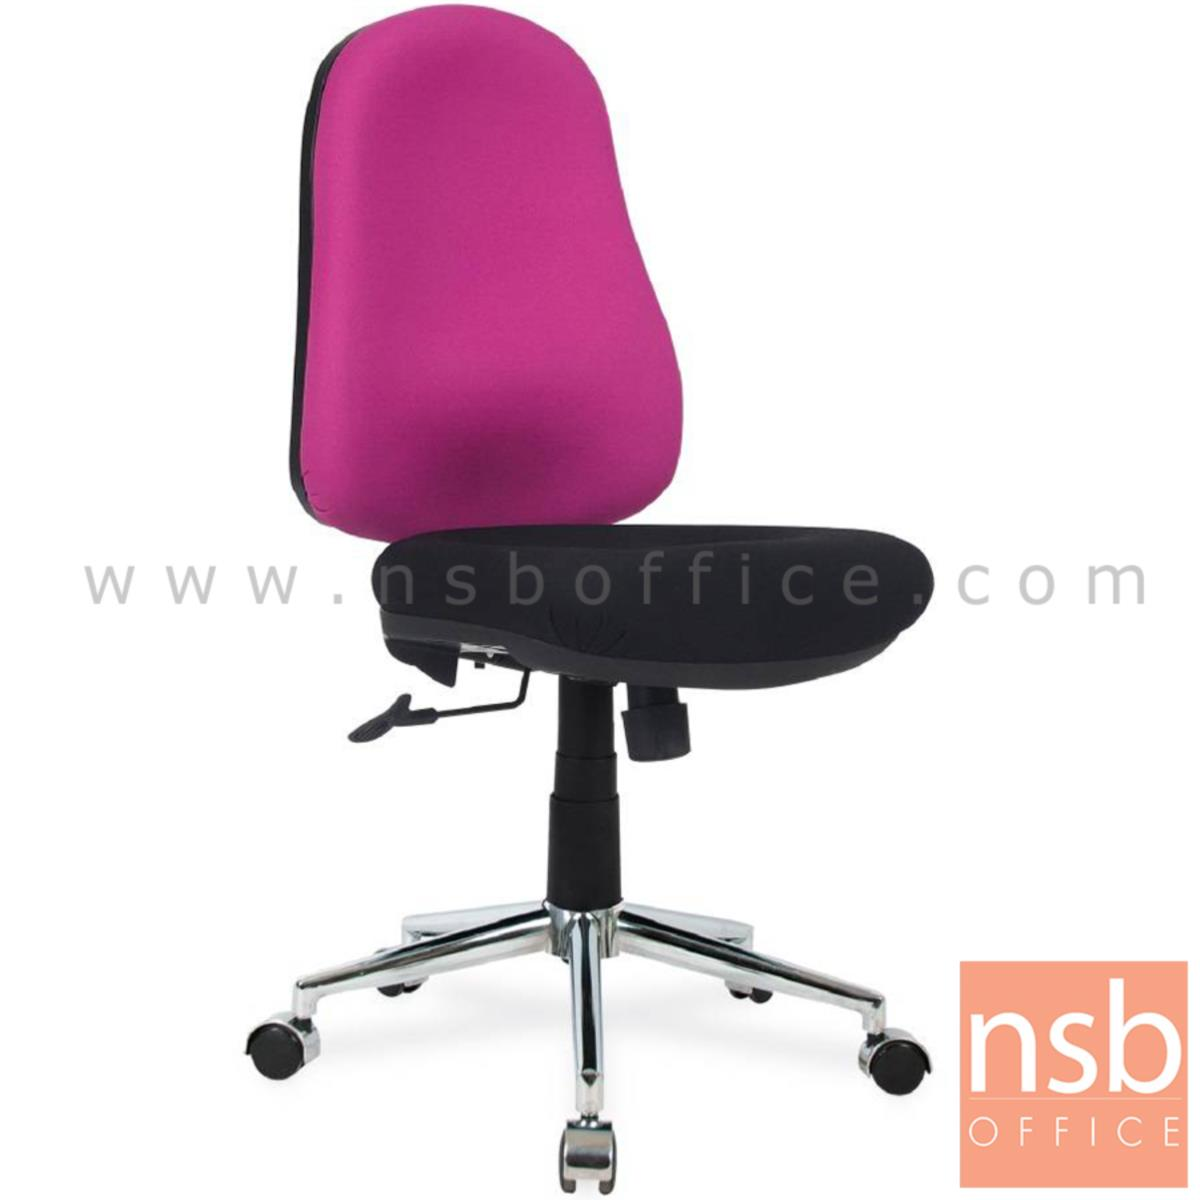 B02A057:เก้าอี้สำนักงาน รุ่น Remaster มีก้อนโยก ขาพลาสติก